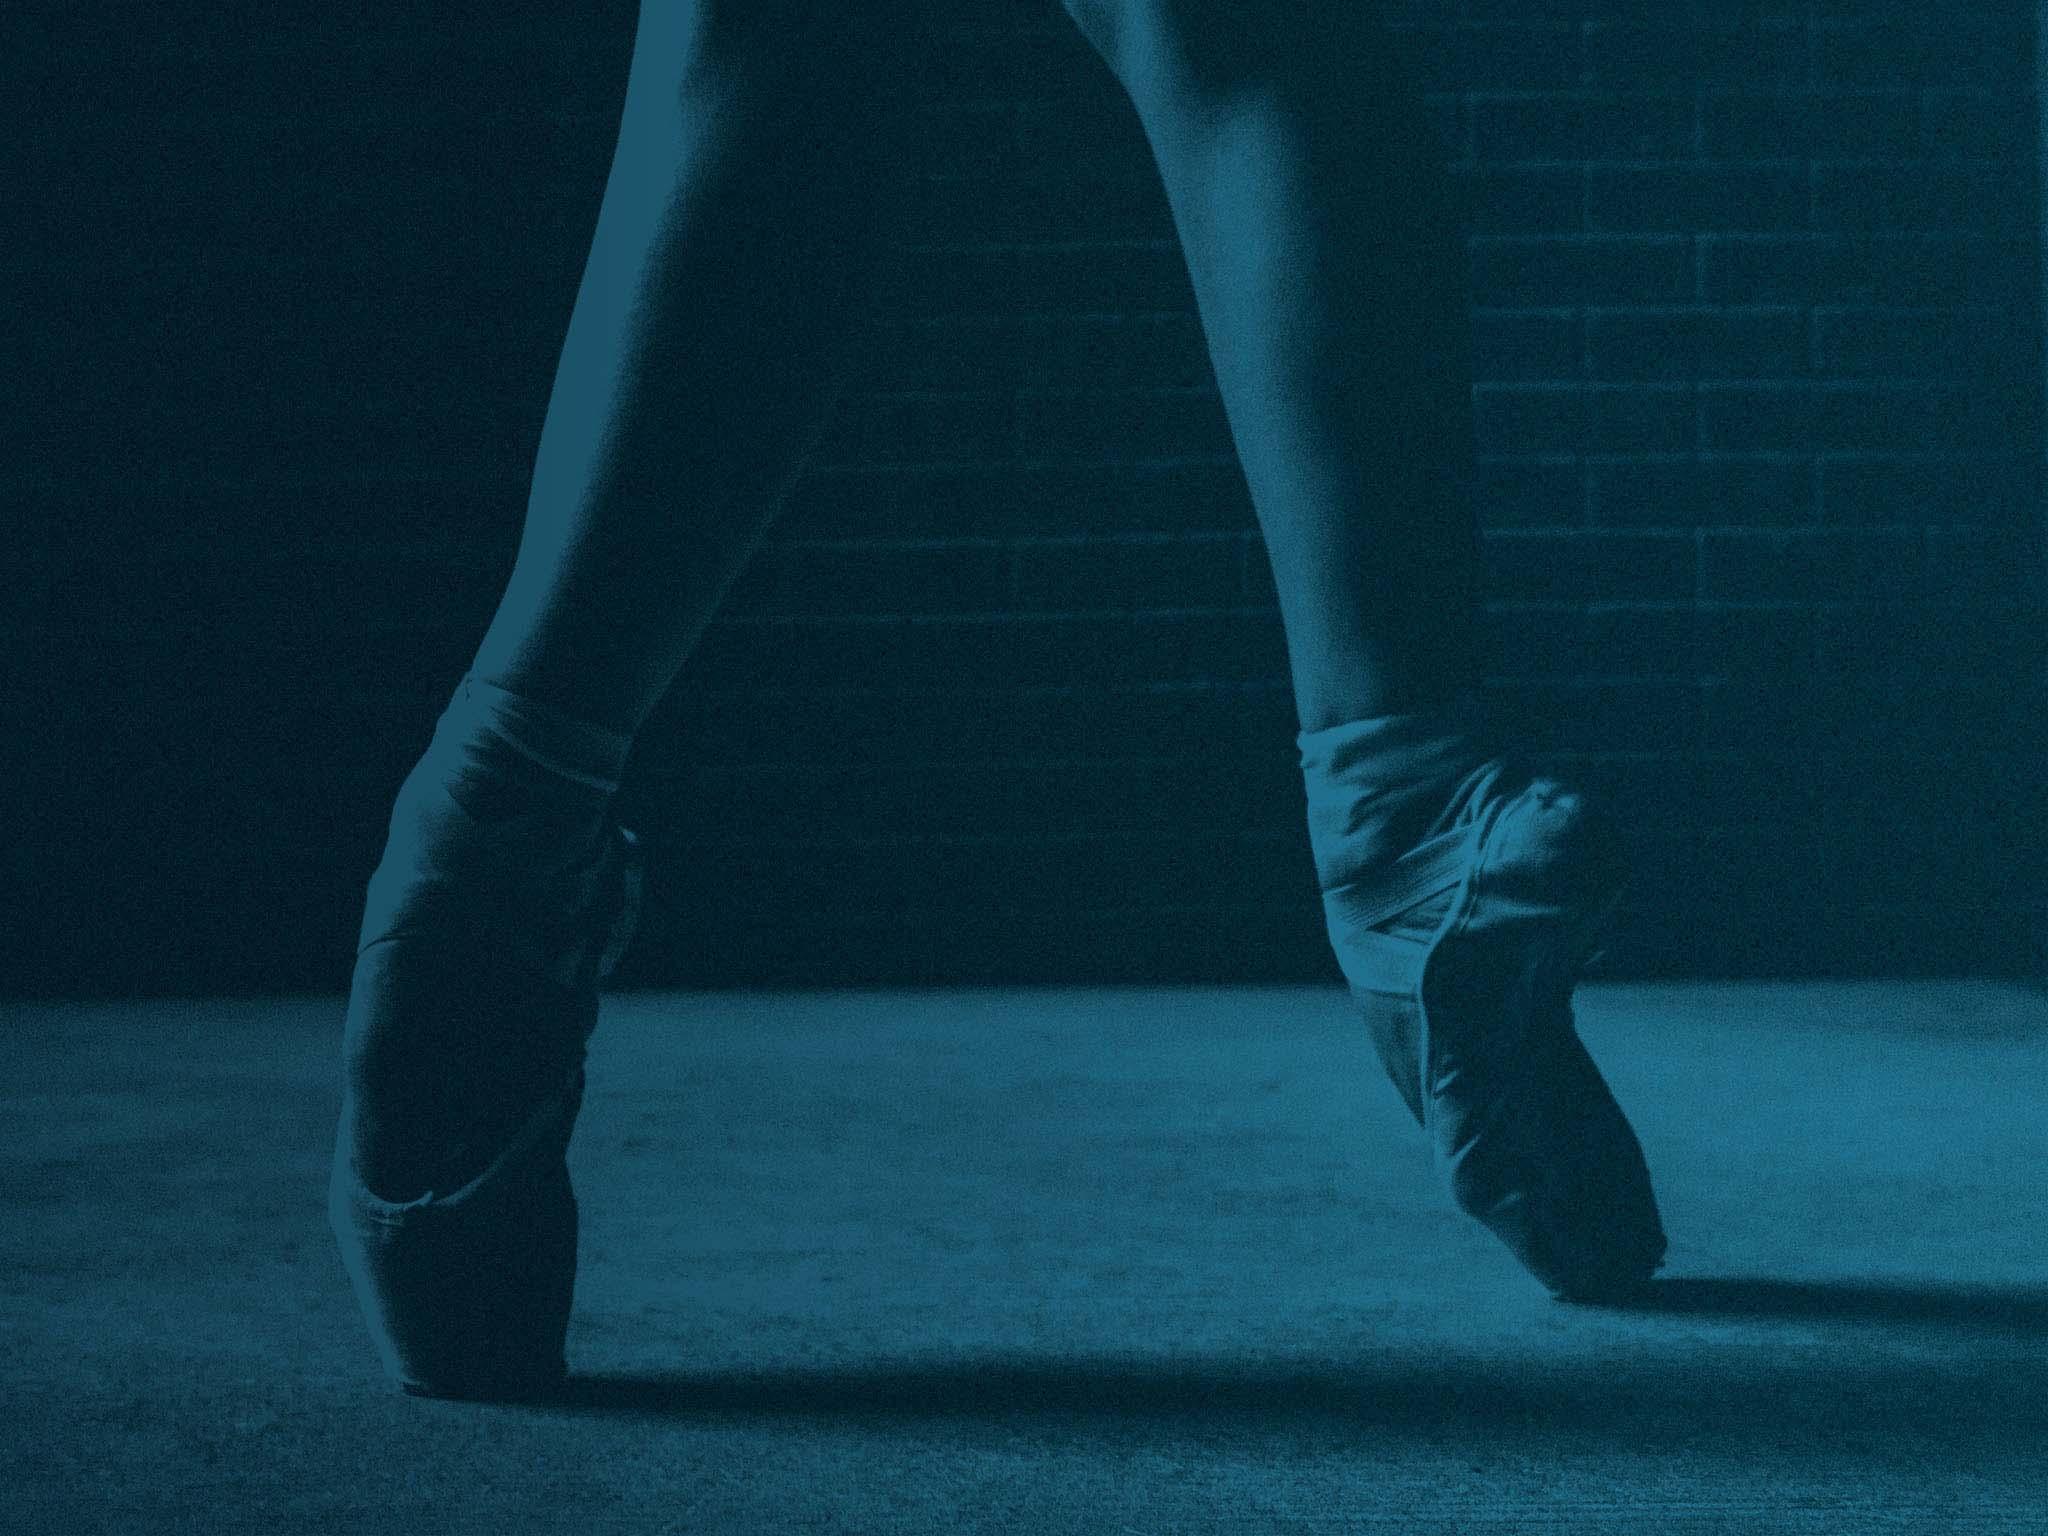 Pieds danseuse - Carousel homepage